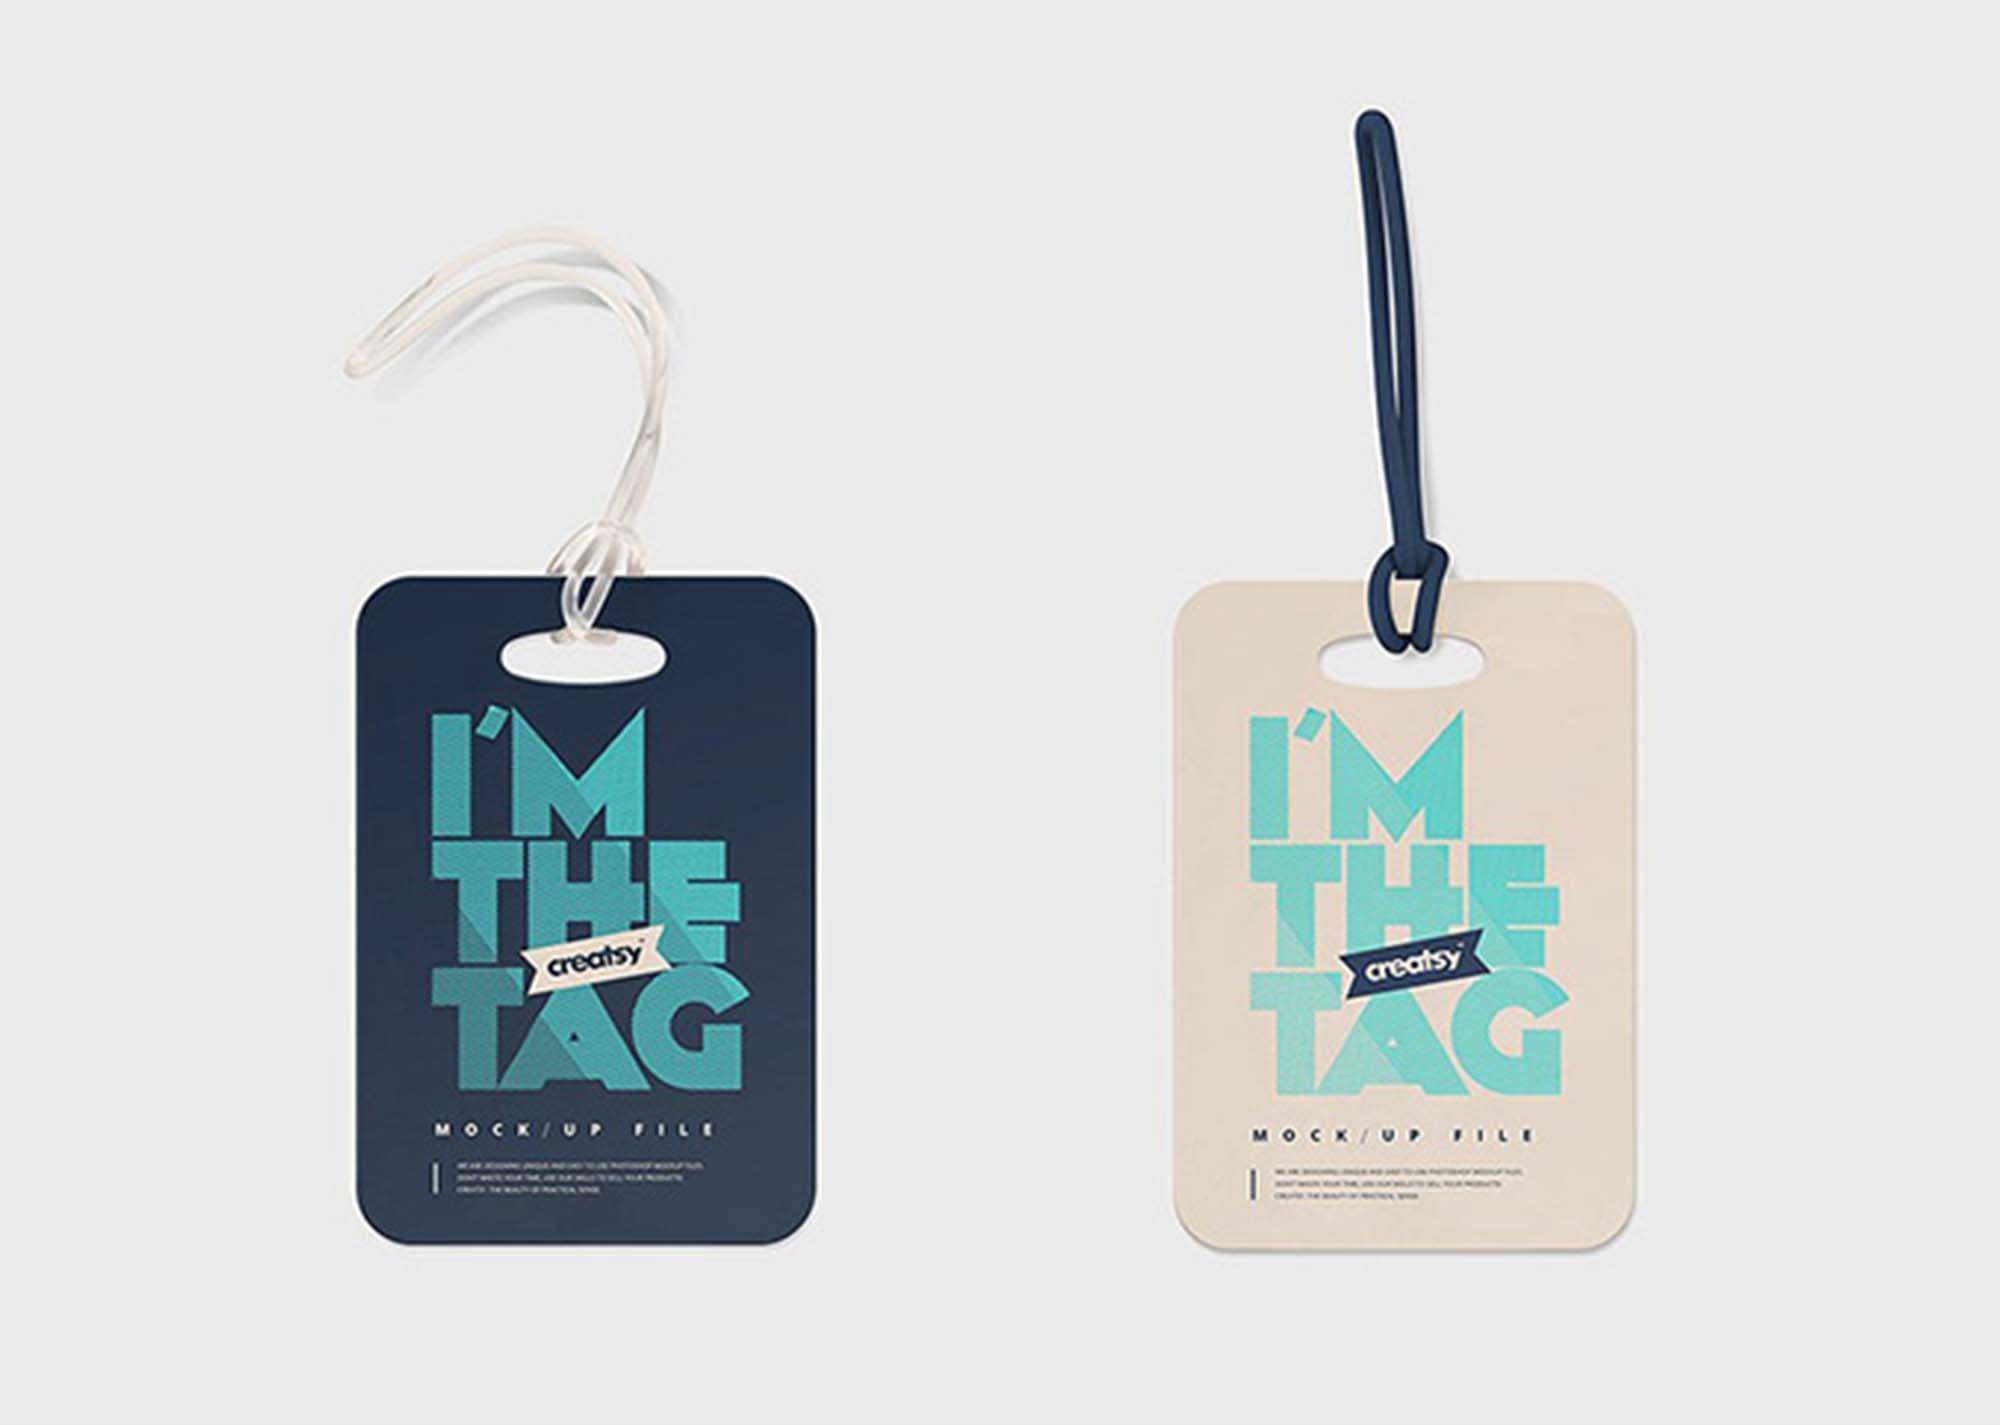 Psd mockup id 13852 in apparel mockups 21. Free Luggage Diaper Tag Mockups Psd